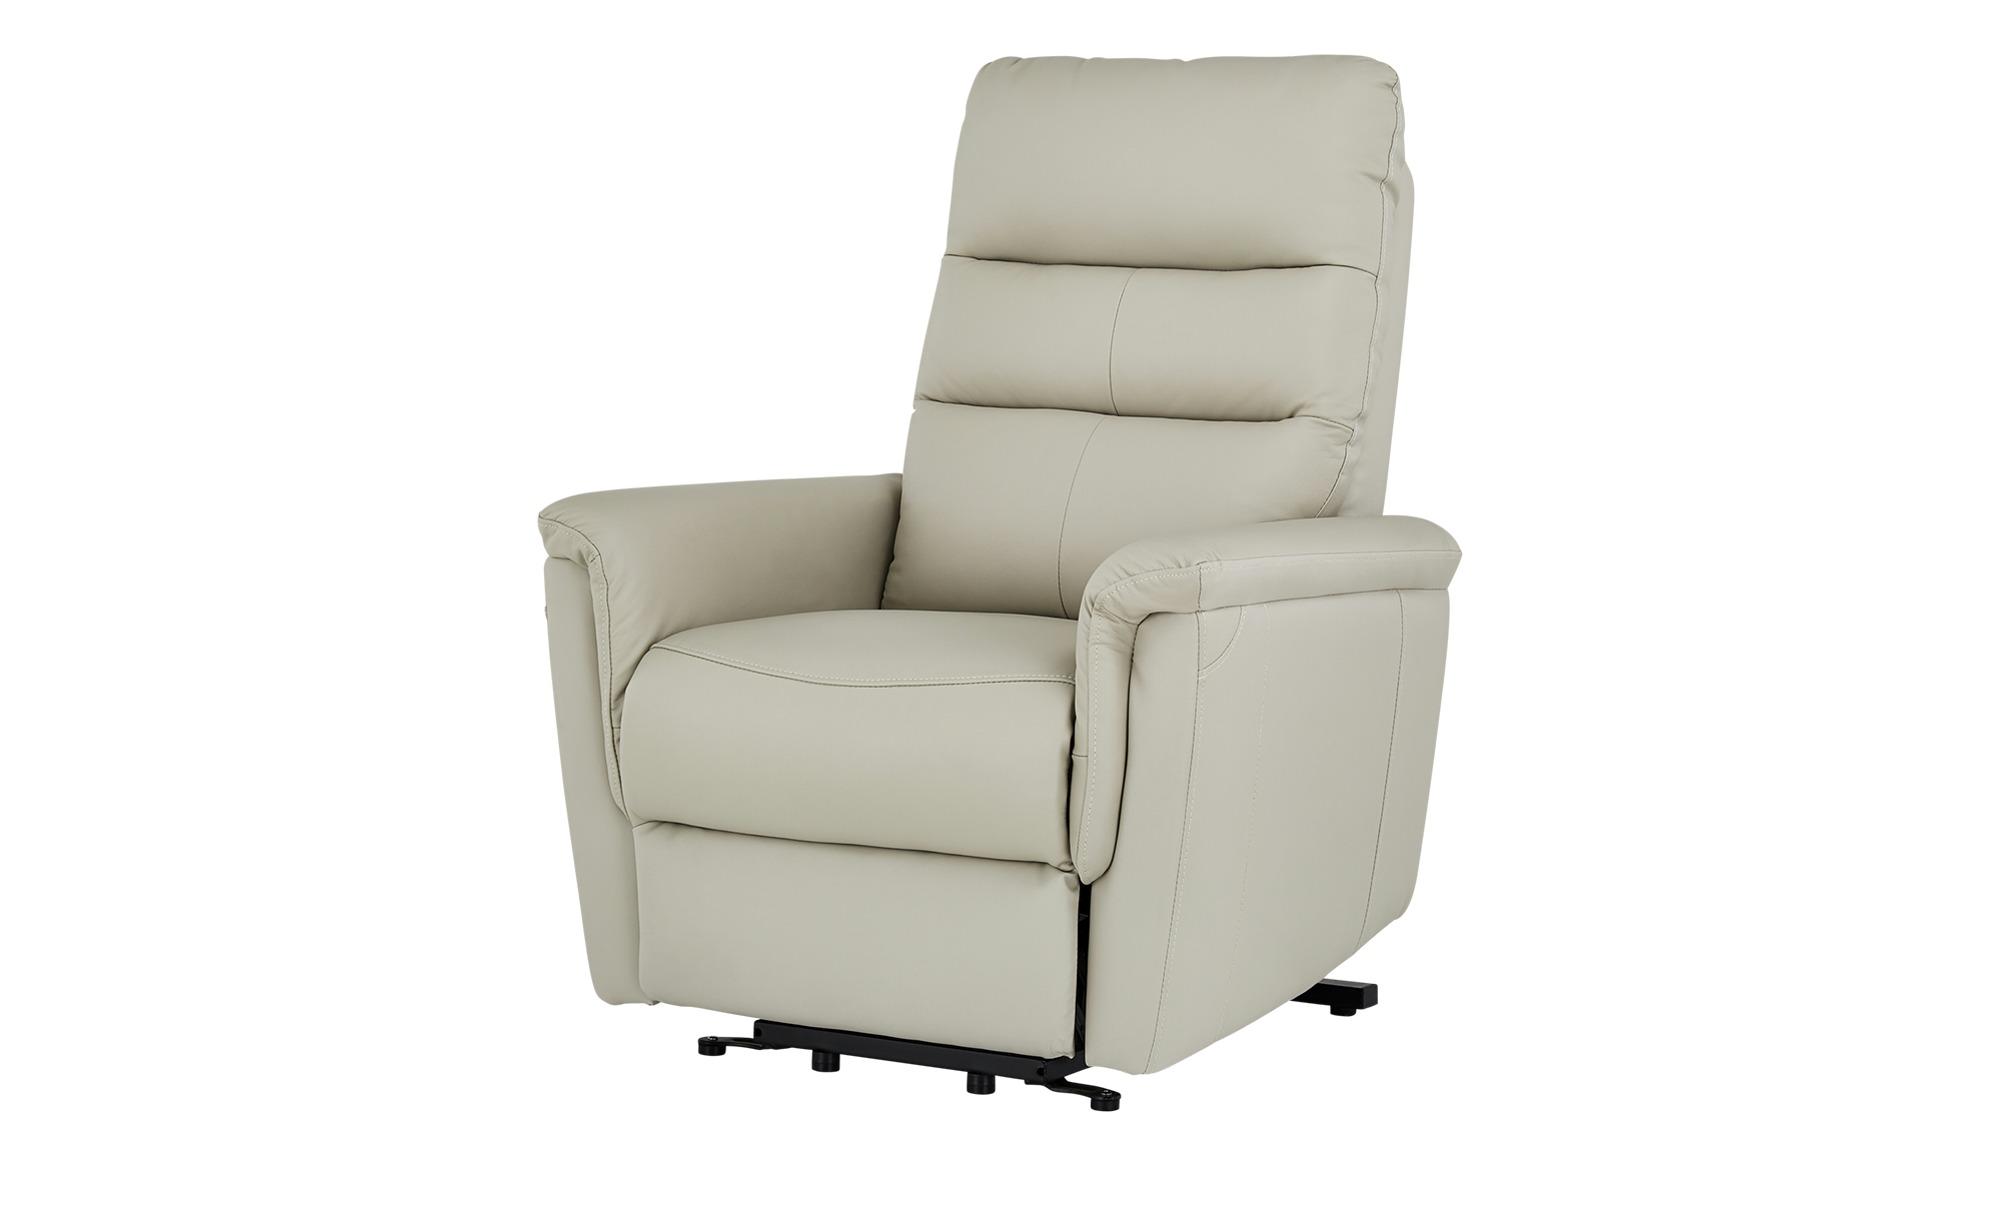 TV-Sessel  Jack ¦ creme ¦ Maße (cm): B: 82 H: 103 T: 93 Polstermöbel > Sessel > Ledersessel - Höffner